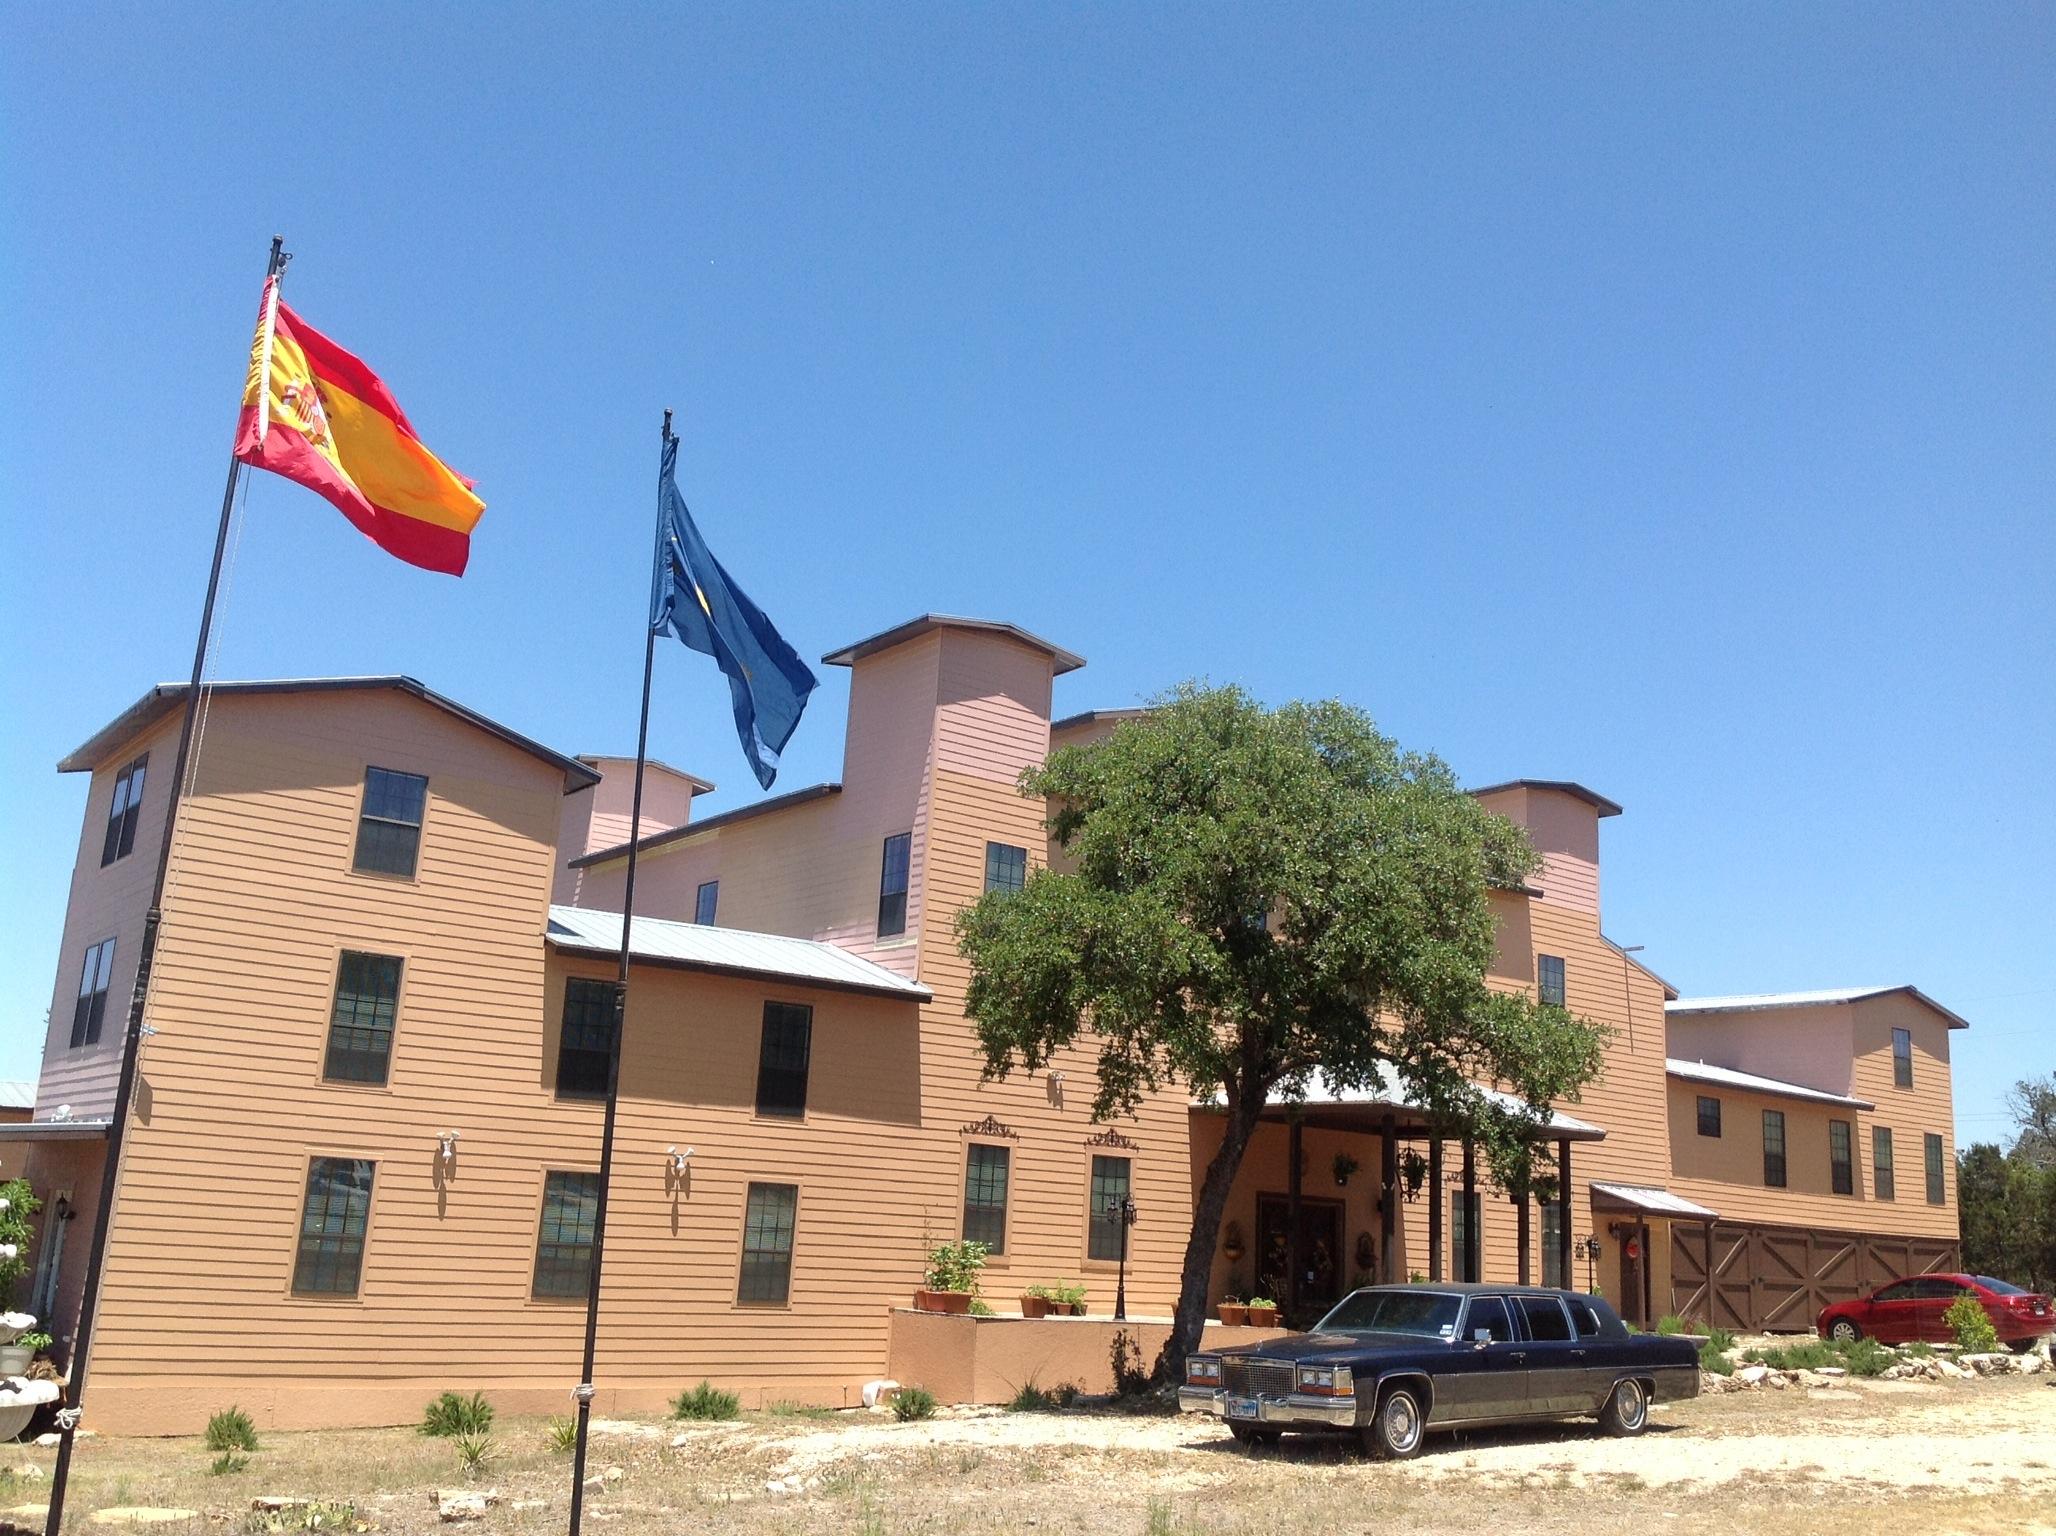 Ione Palace